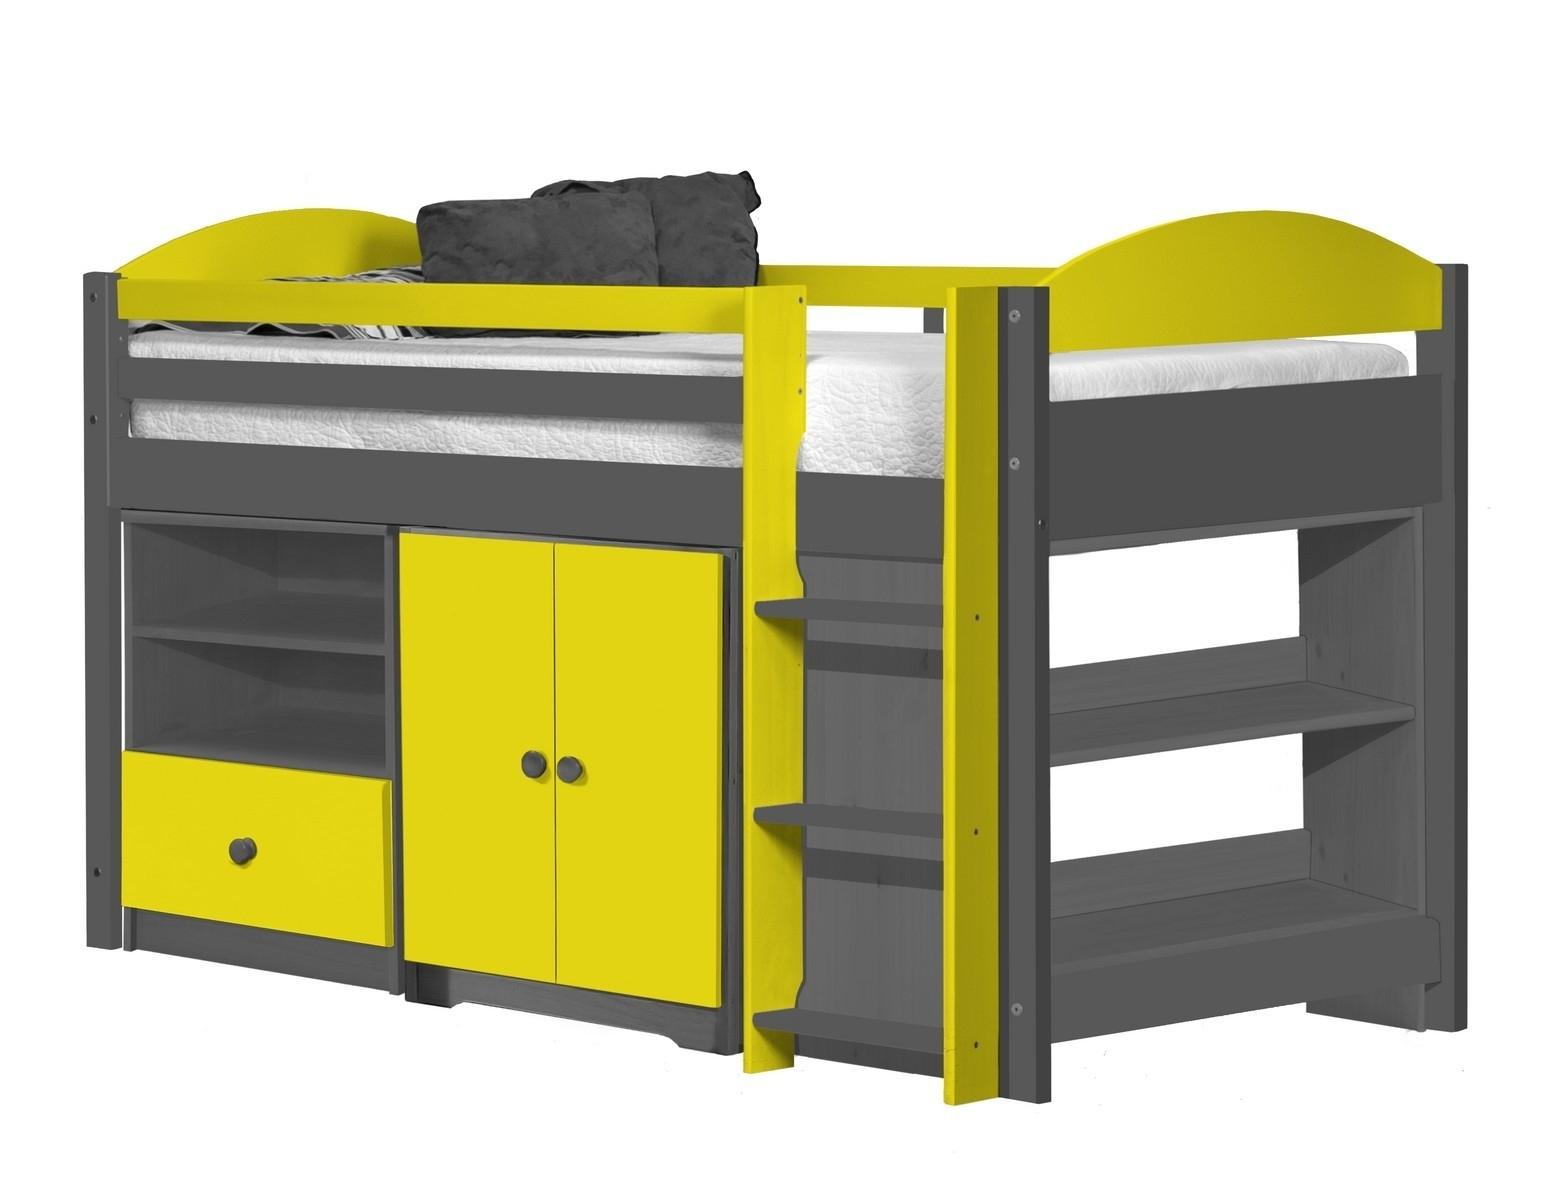 lit combin mi haut graphite et jaune aladin. Black Bedroom Furniture Sets. Home Design Ideas